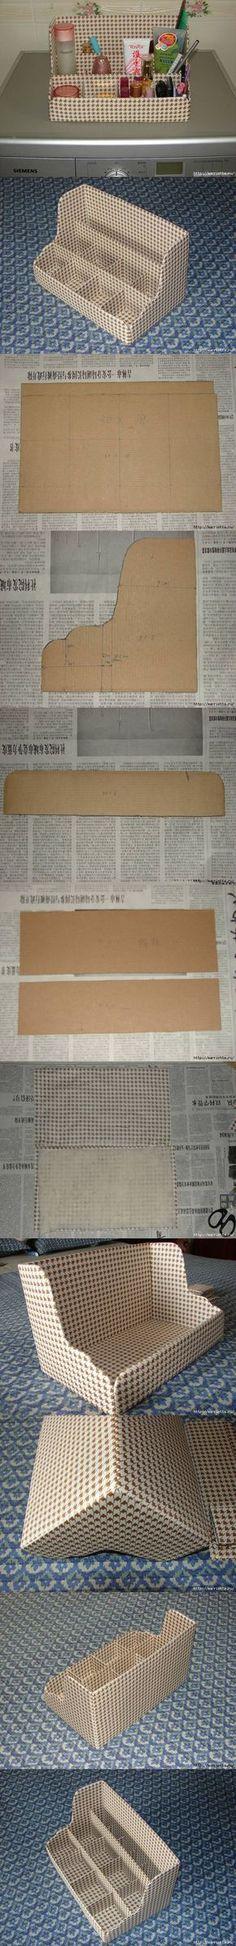 DIY-Cardboard-Shelves-Organizer.jpg 644×5,313 pixeles